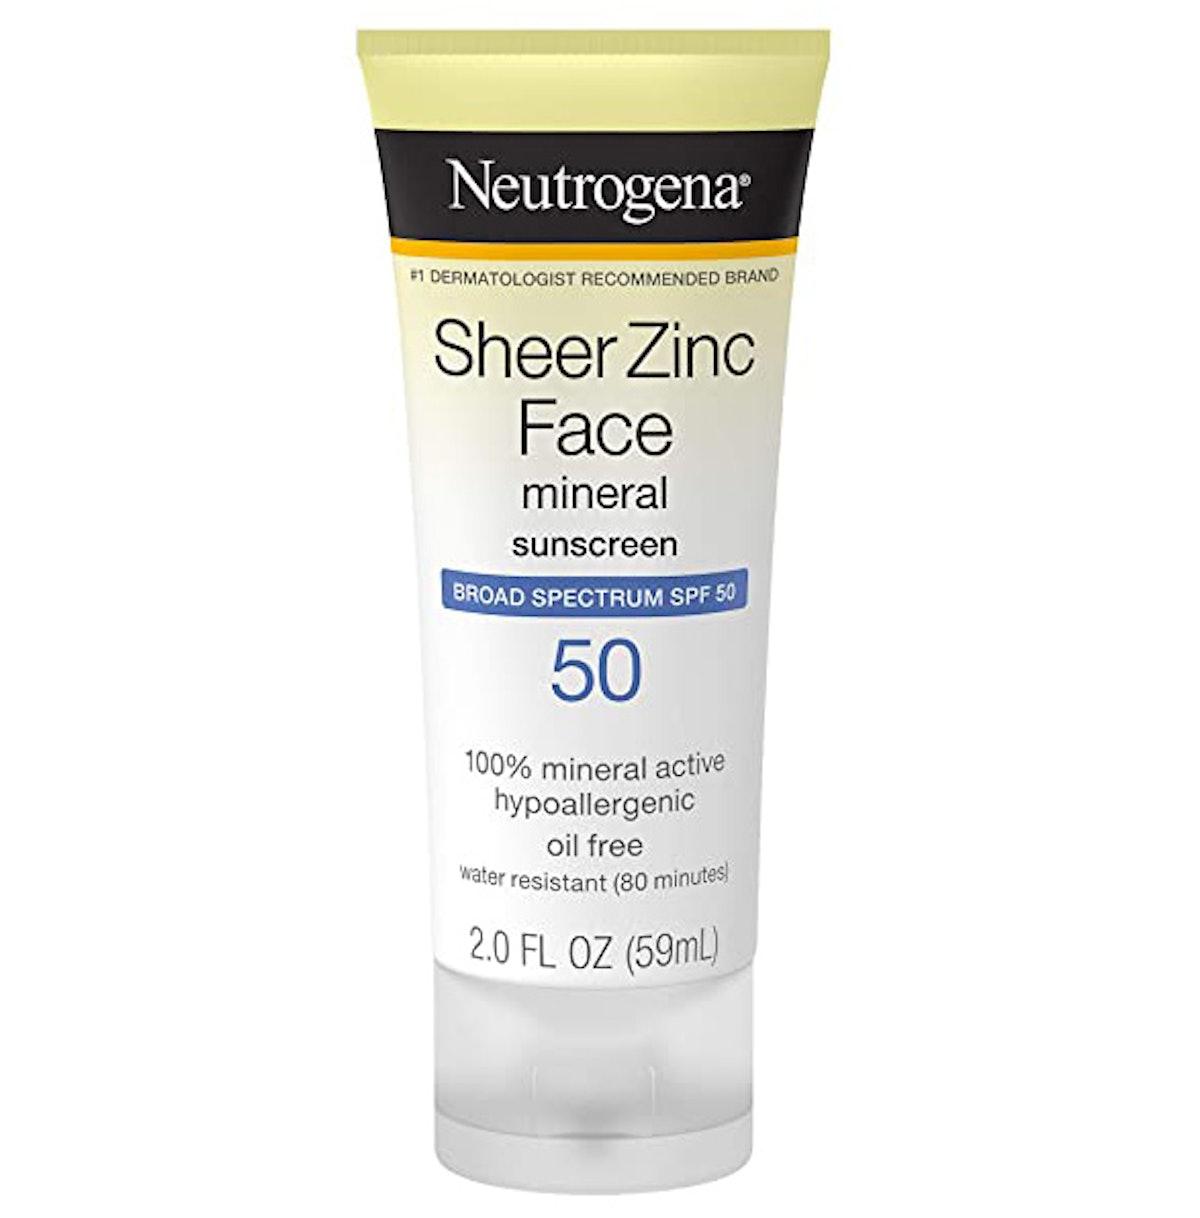 Neutrogena Sheer Zinc Face